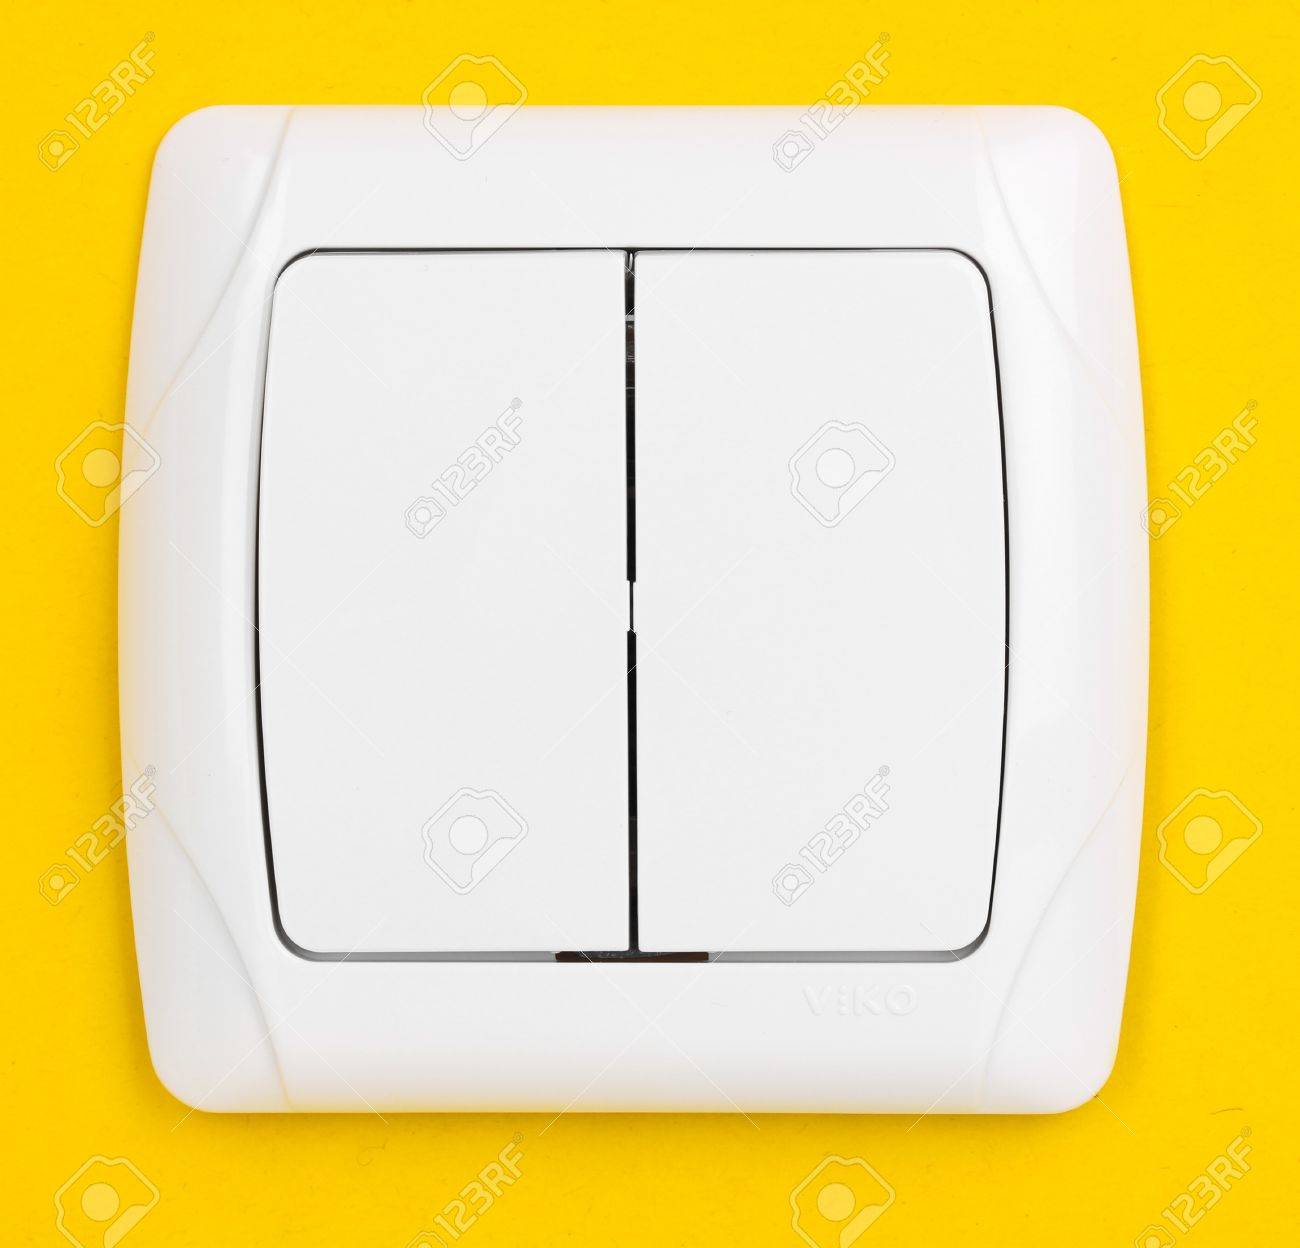 Modern light switch on yellow background Stock Photo - 14098206